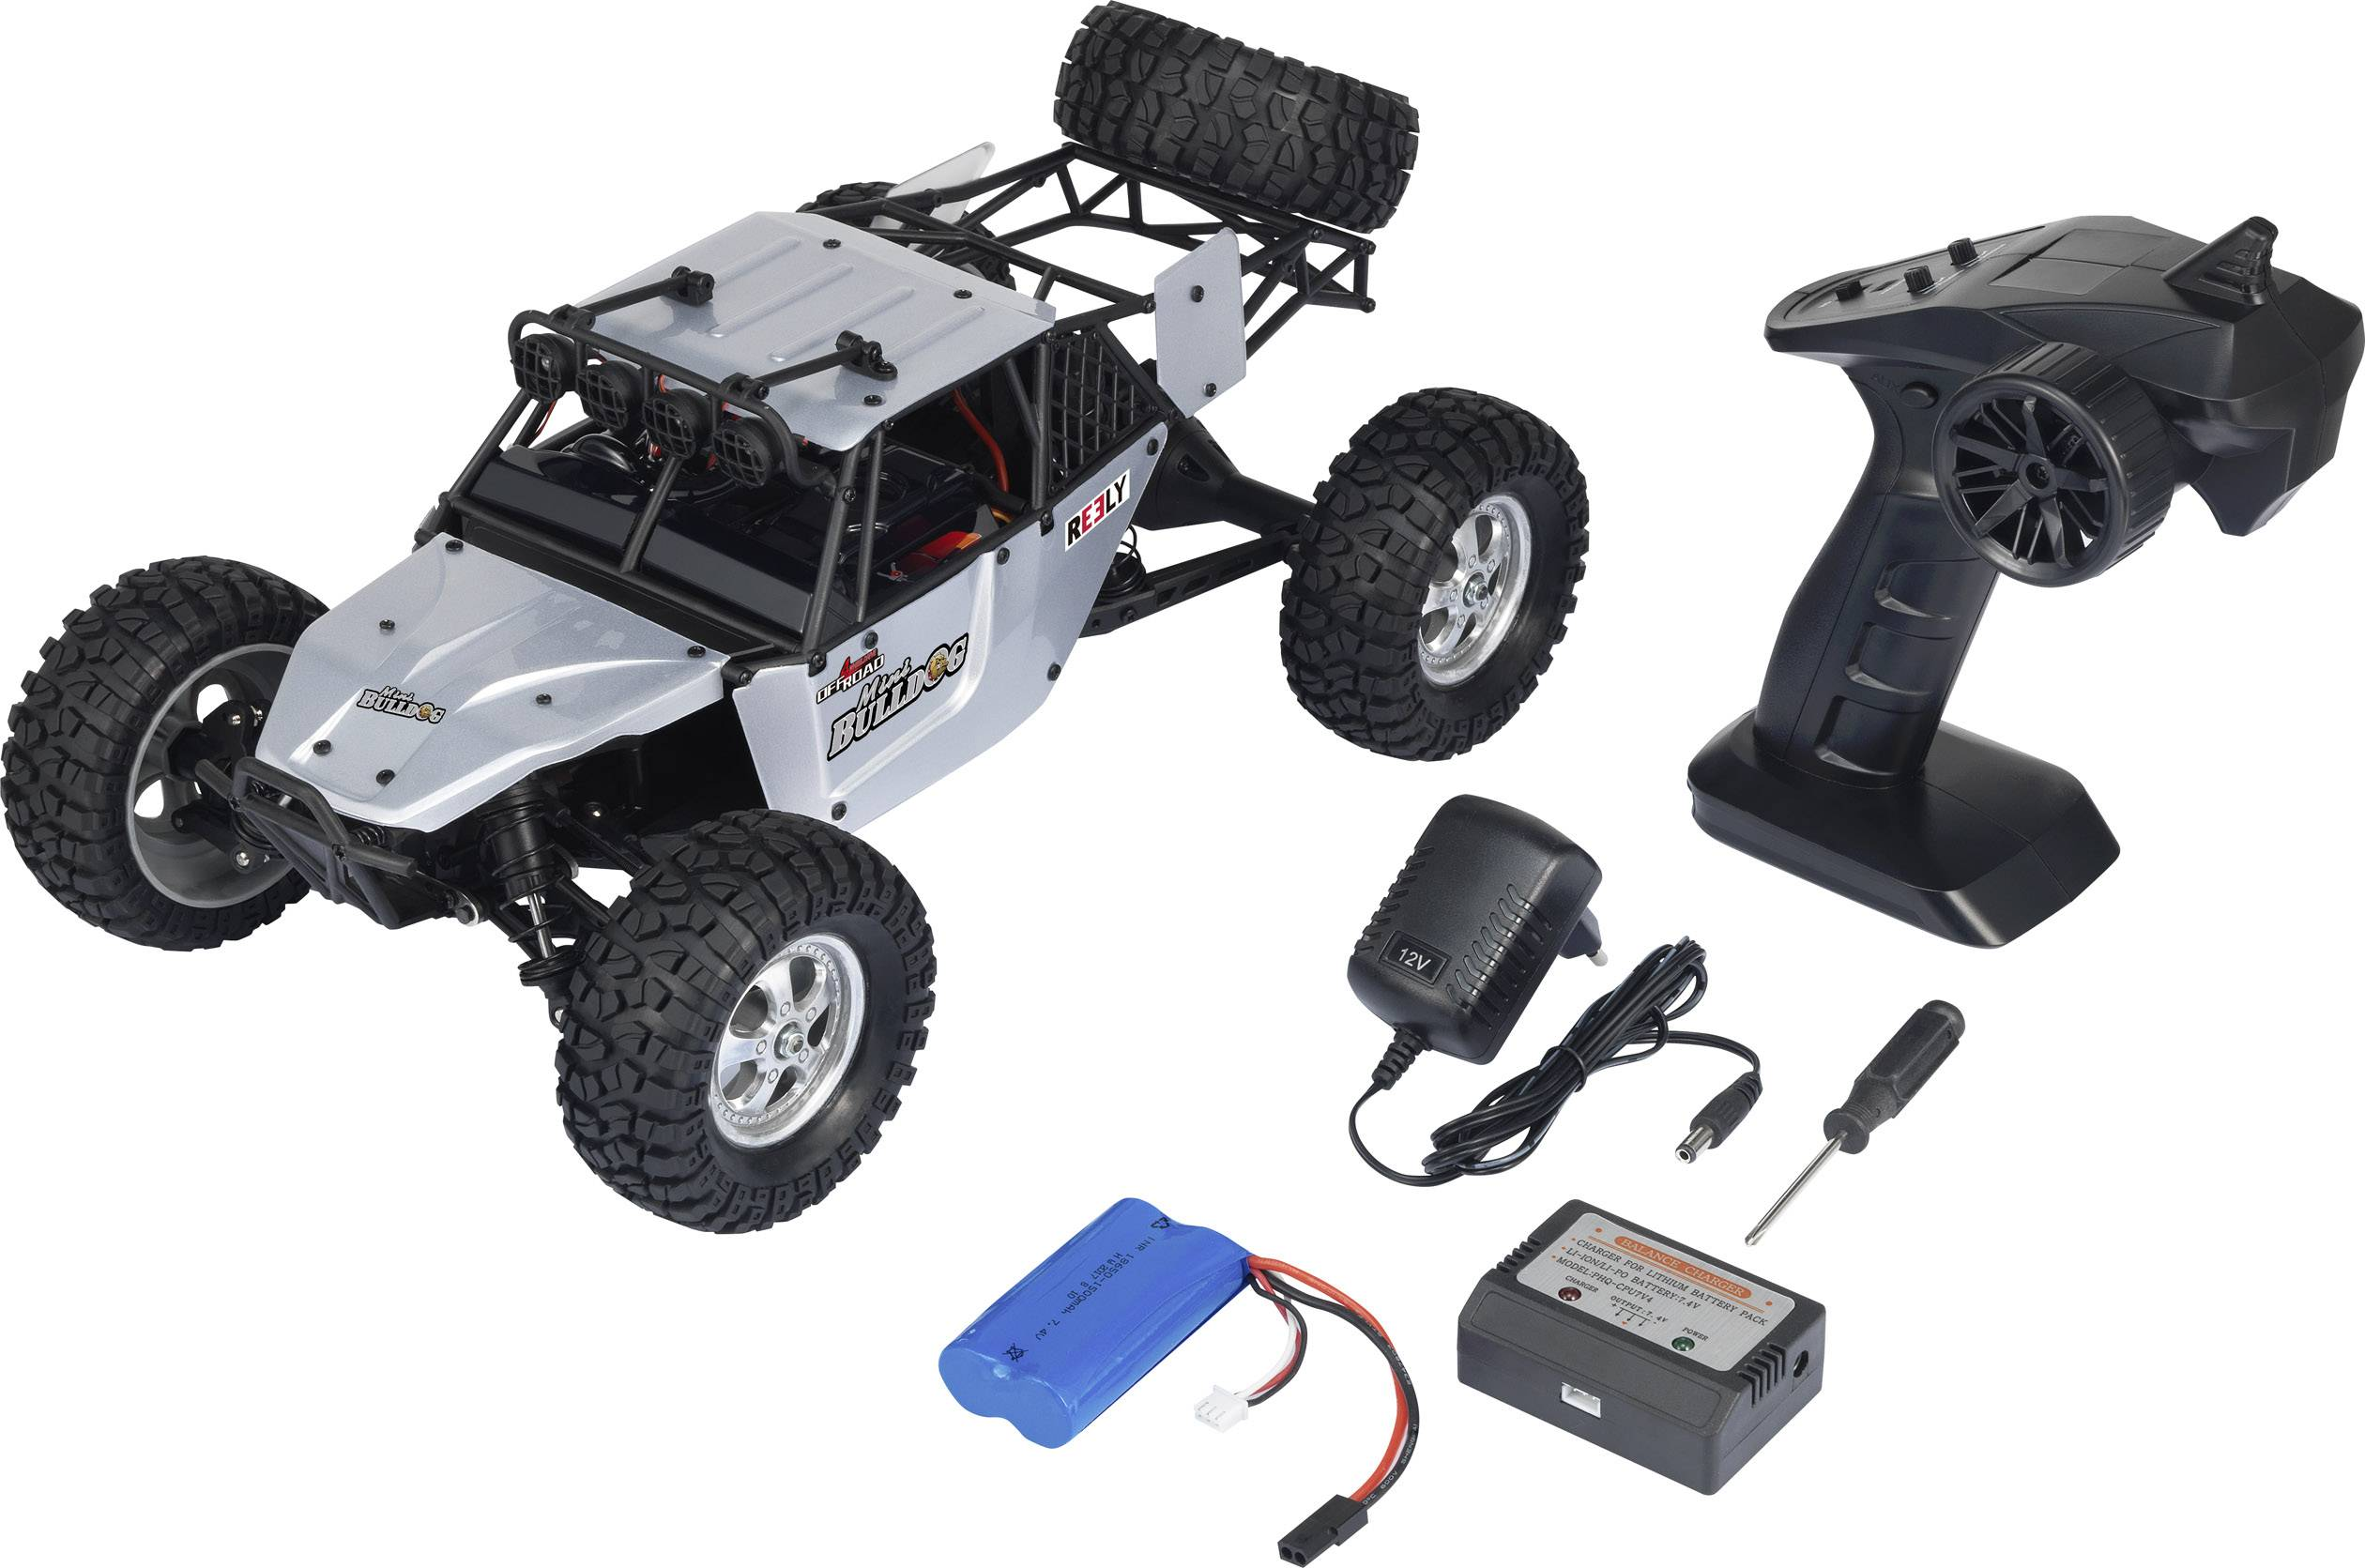 RC model auta Buggy Reely Bulldog Mini, komutátorový, 1:10 XS, 4WD (4x4), RtR, 25 km/h